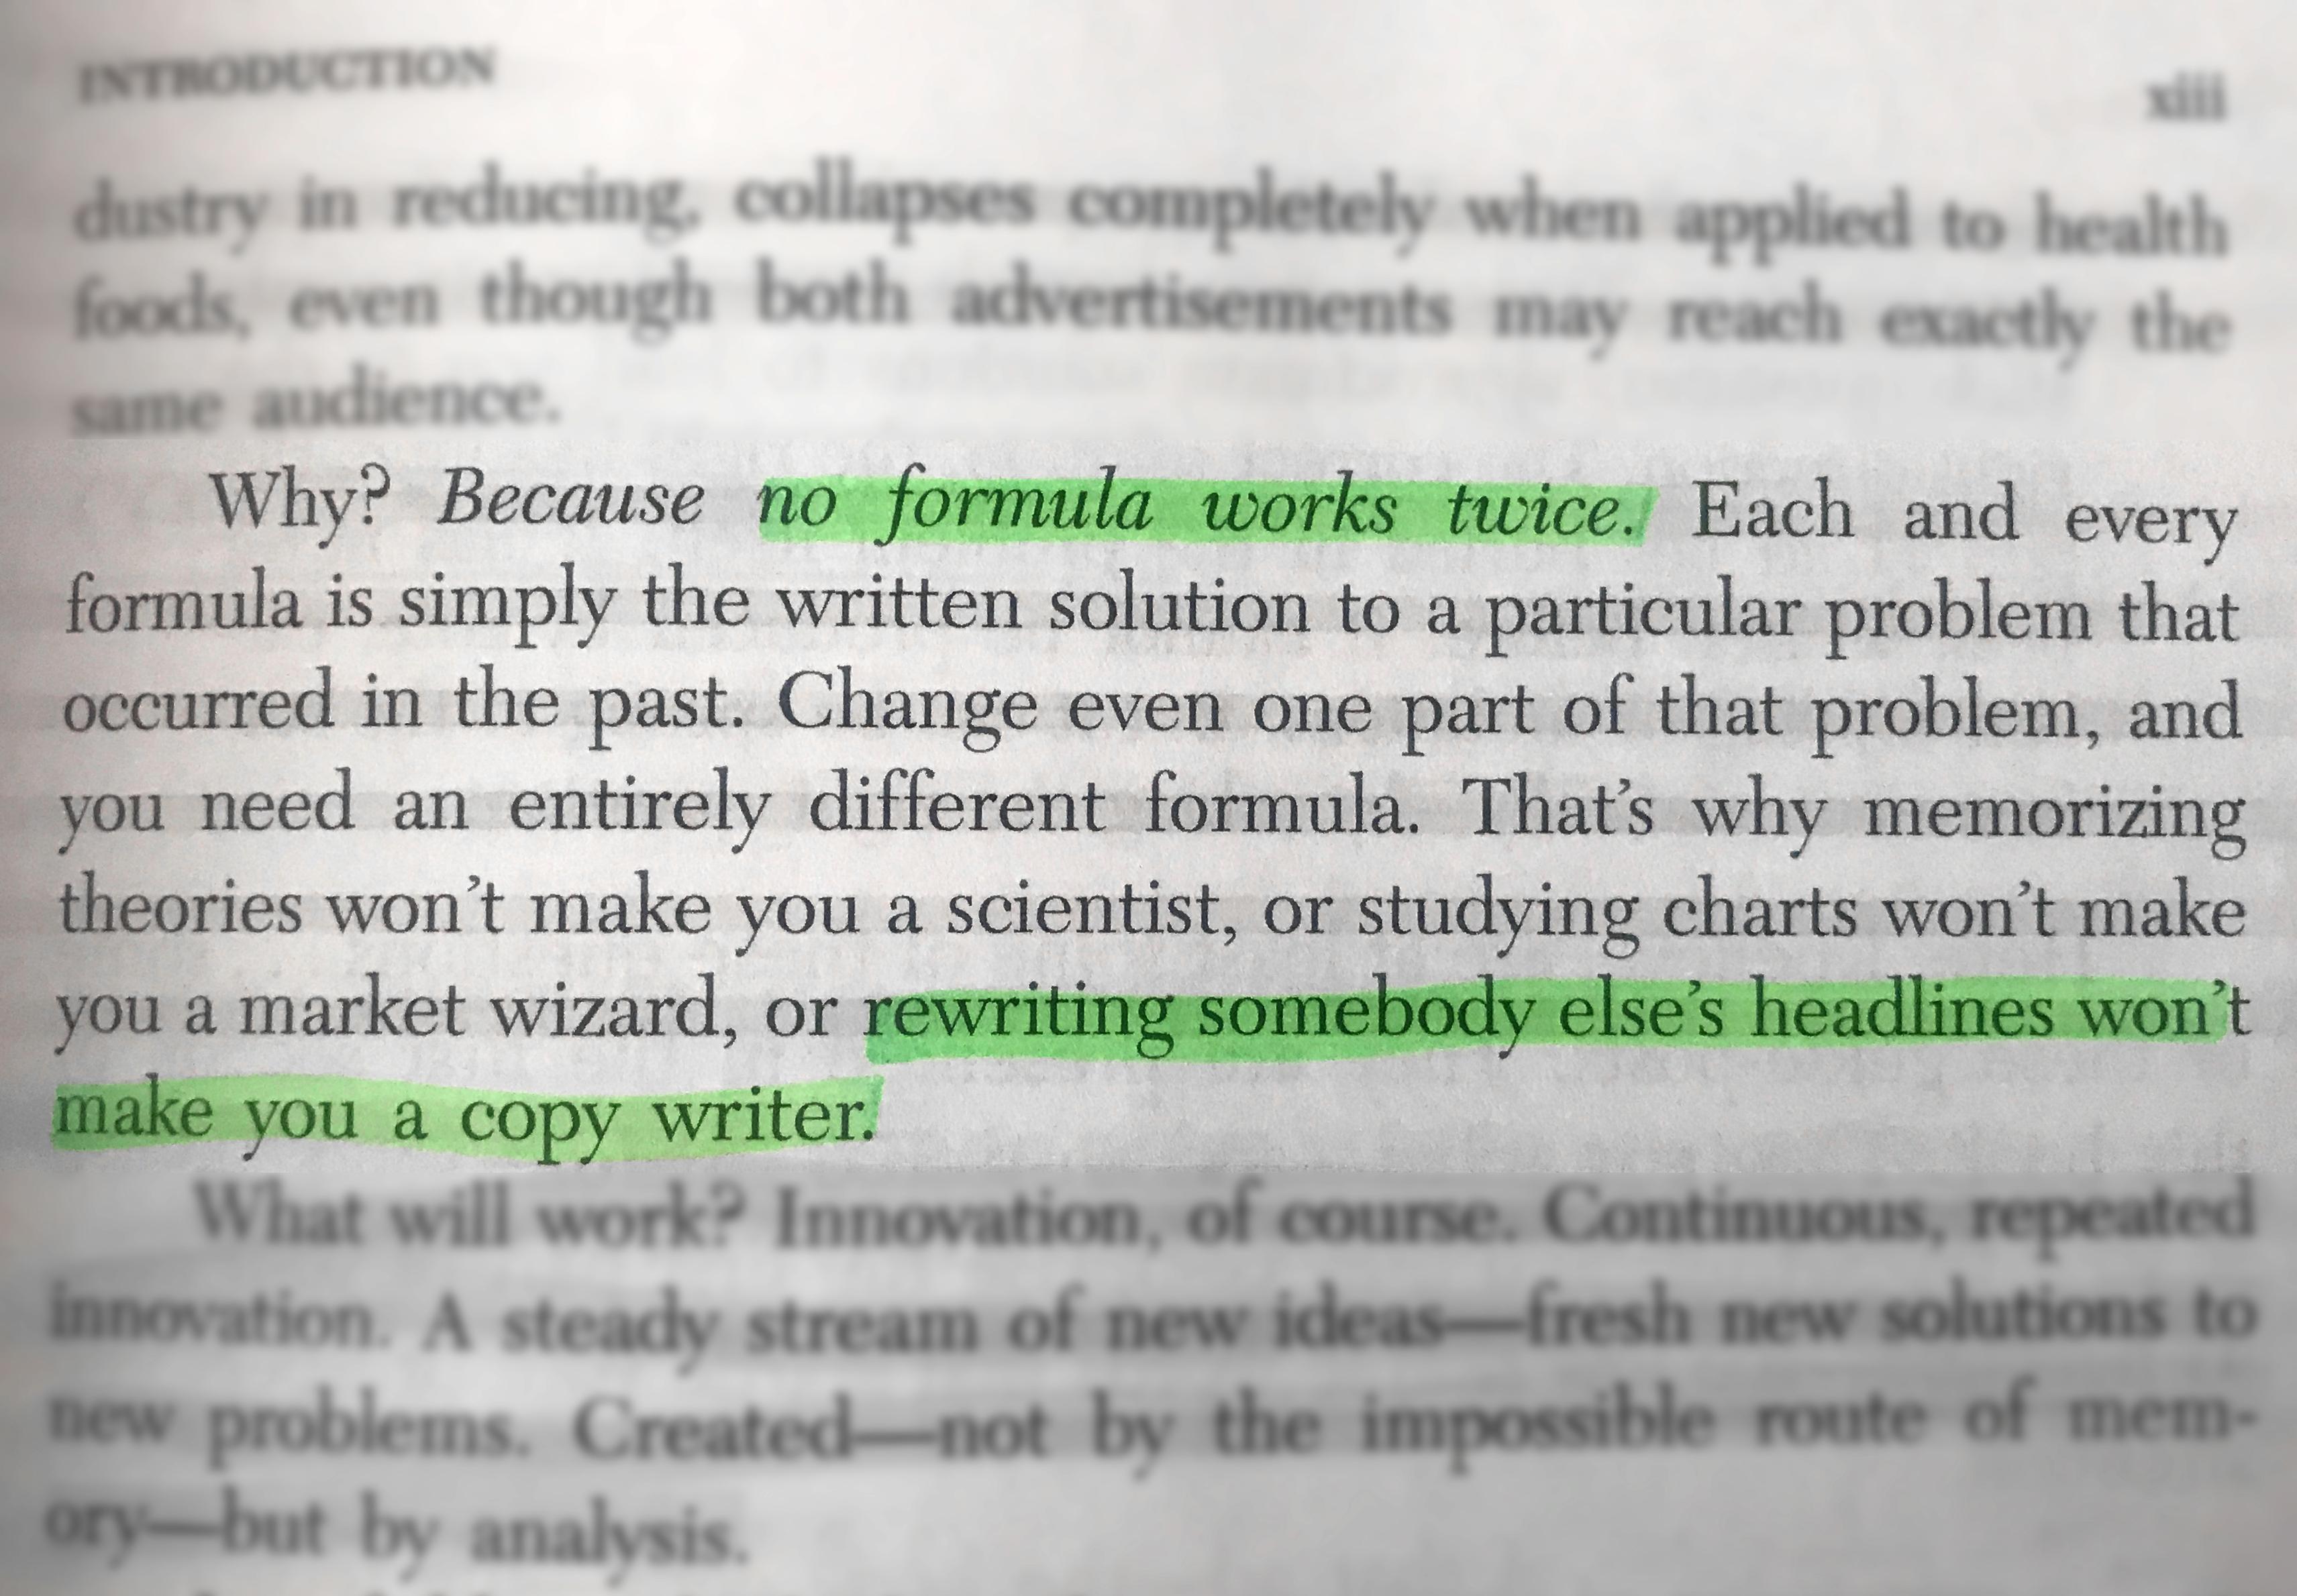 Eugene Schwartz le dit même dans son livre Breakthrough Advertising